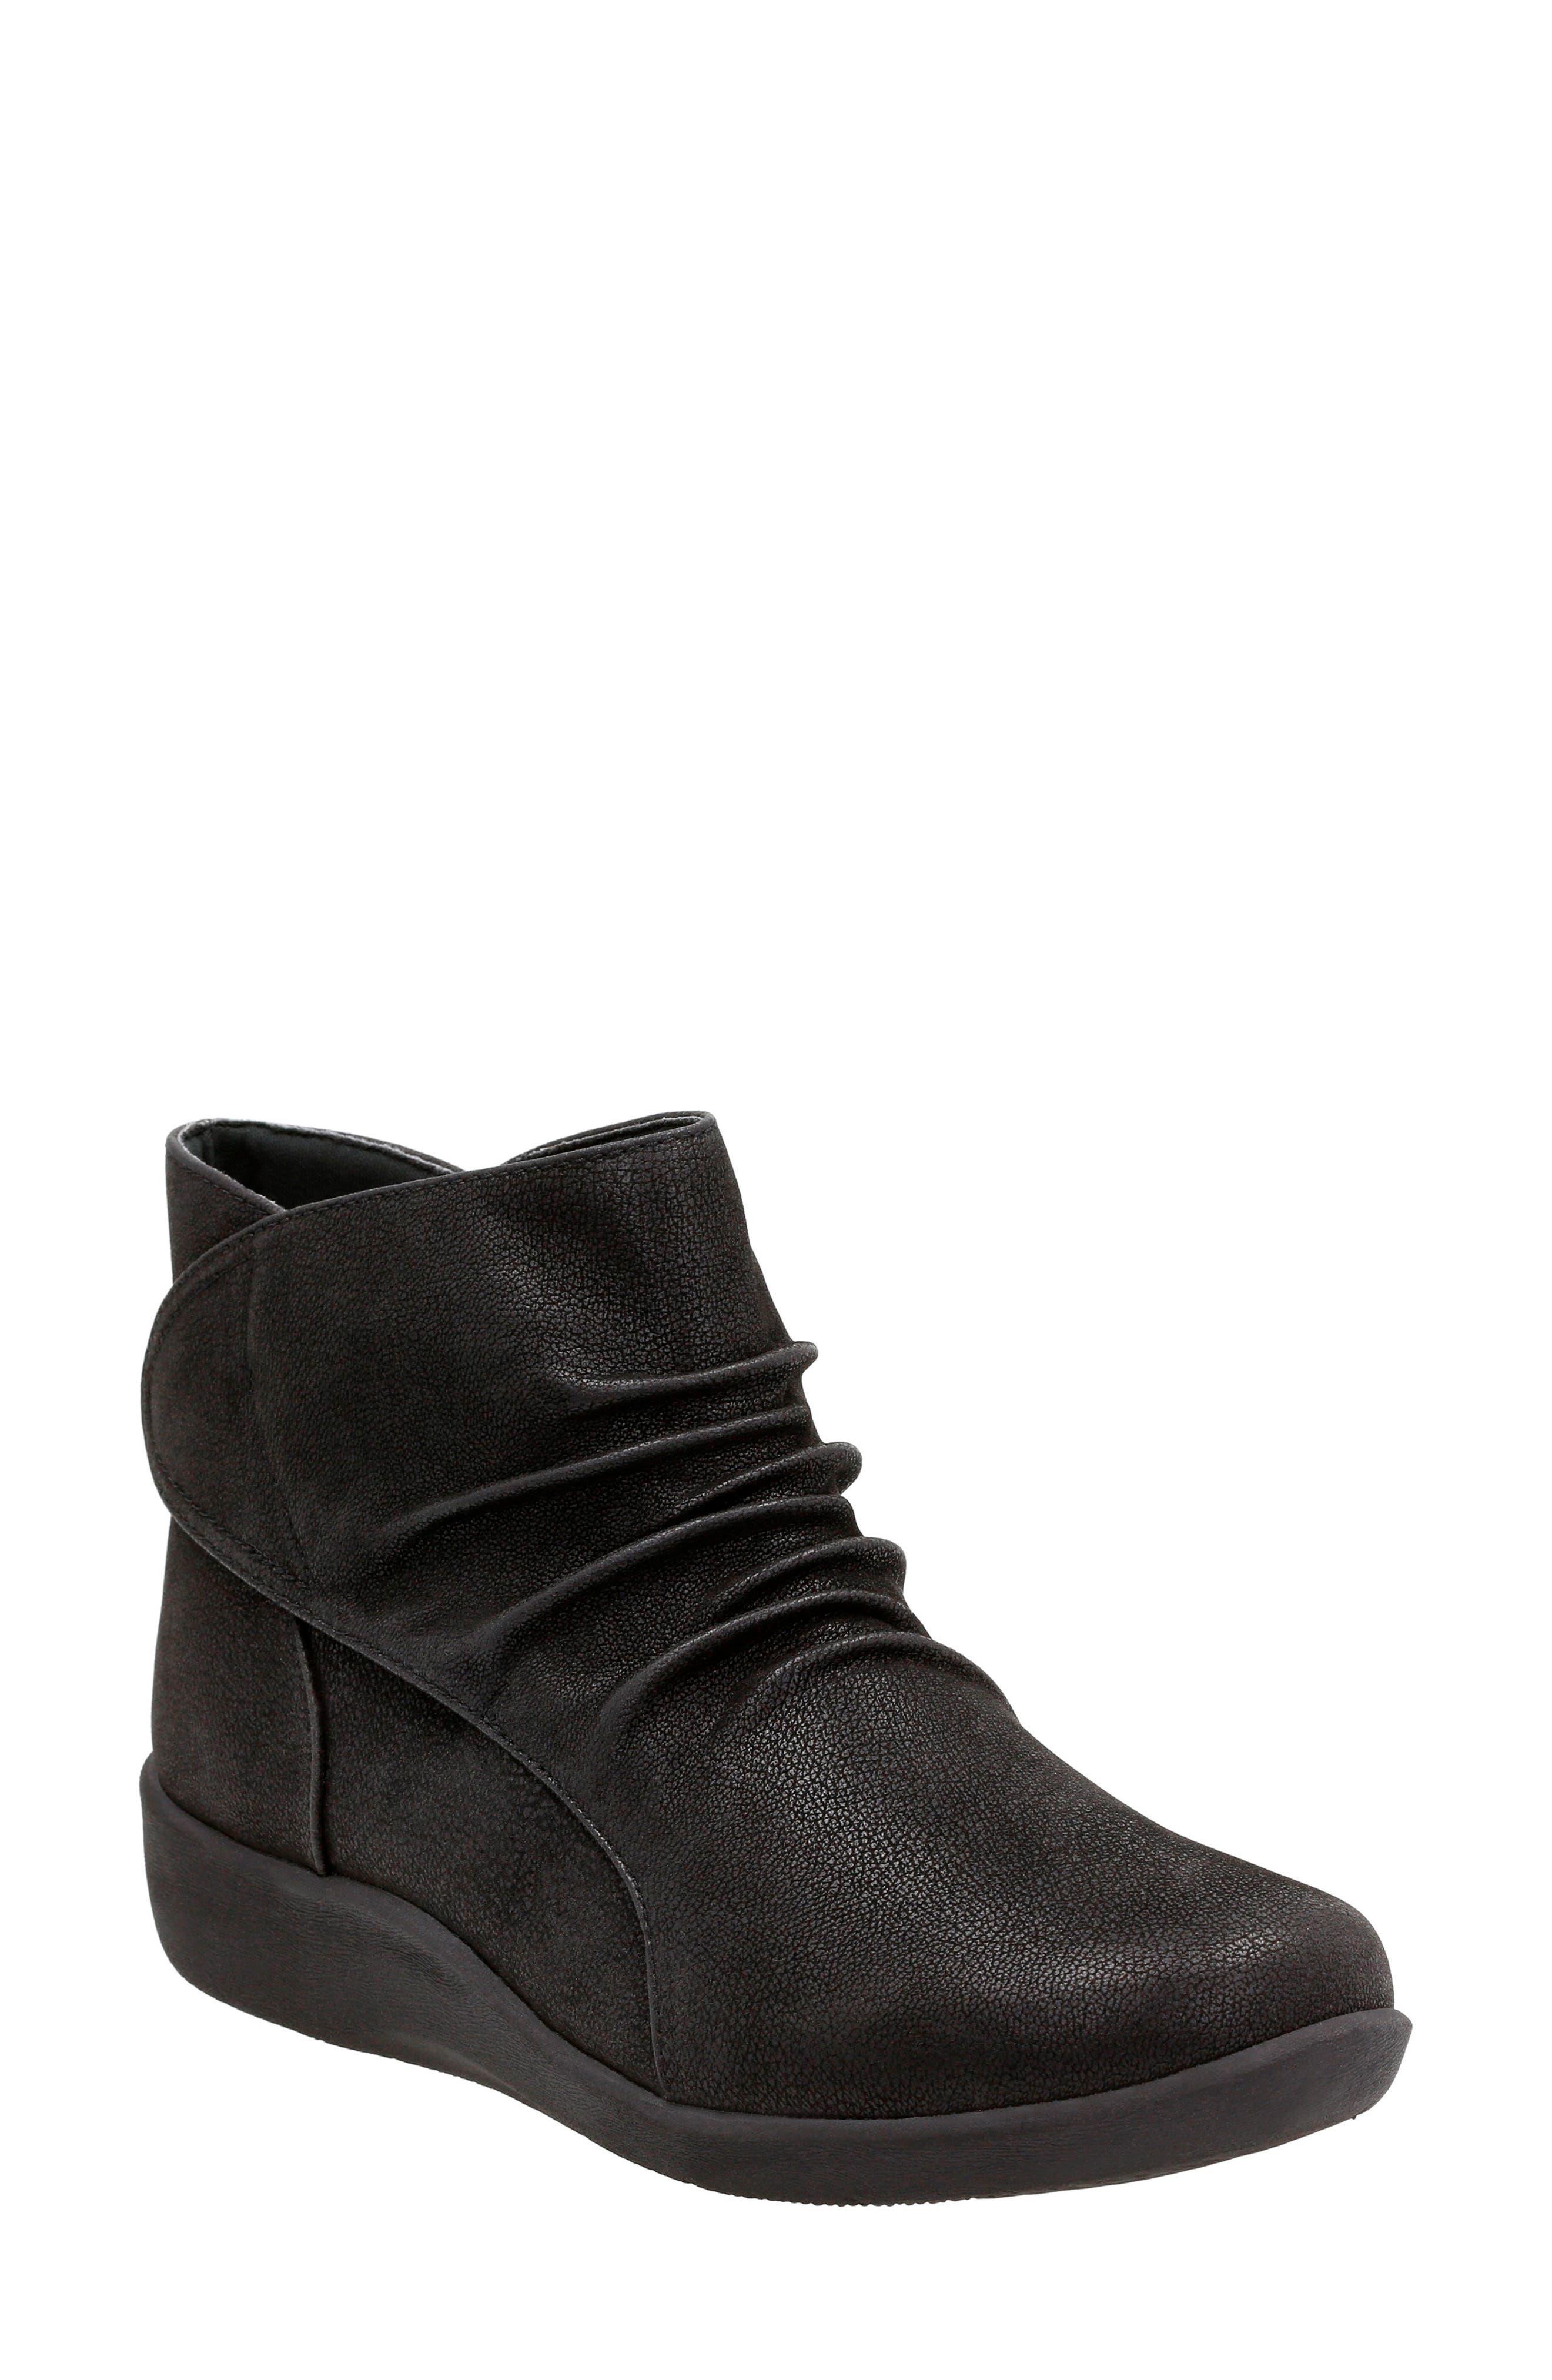 Sillian Sway Boot,                         Main,                         color, Black Fabric